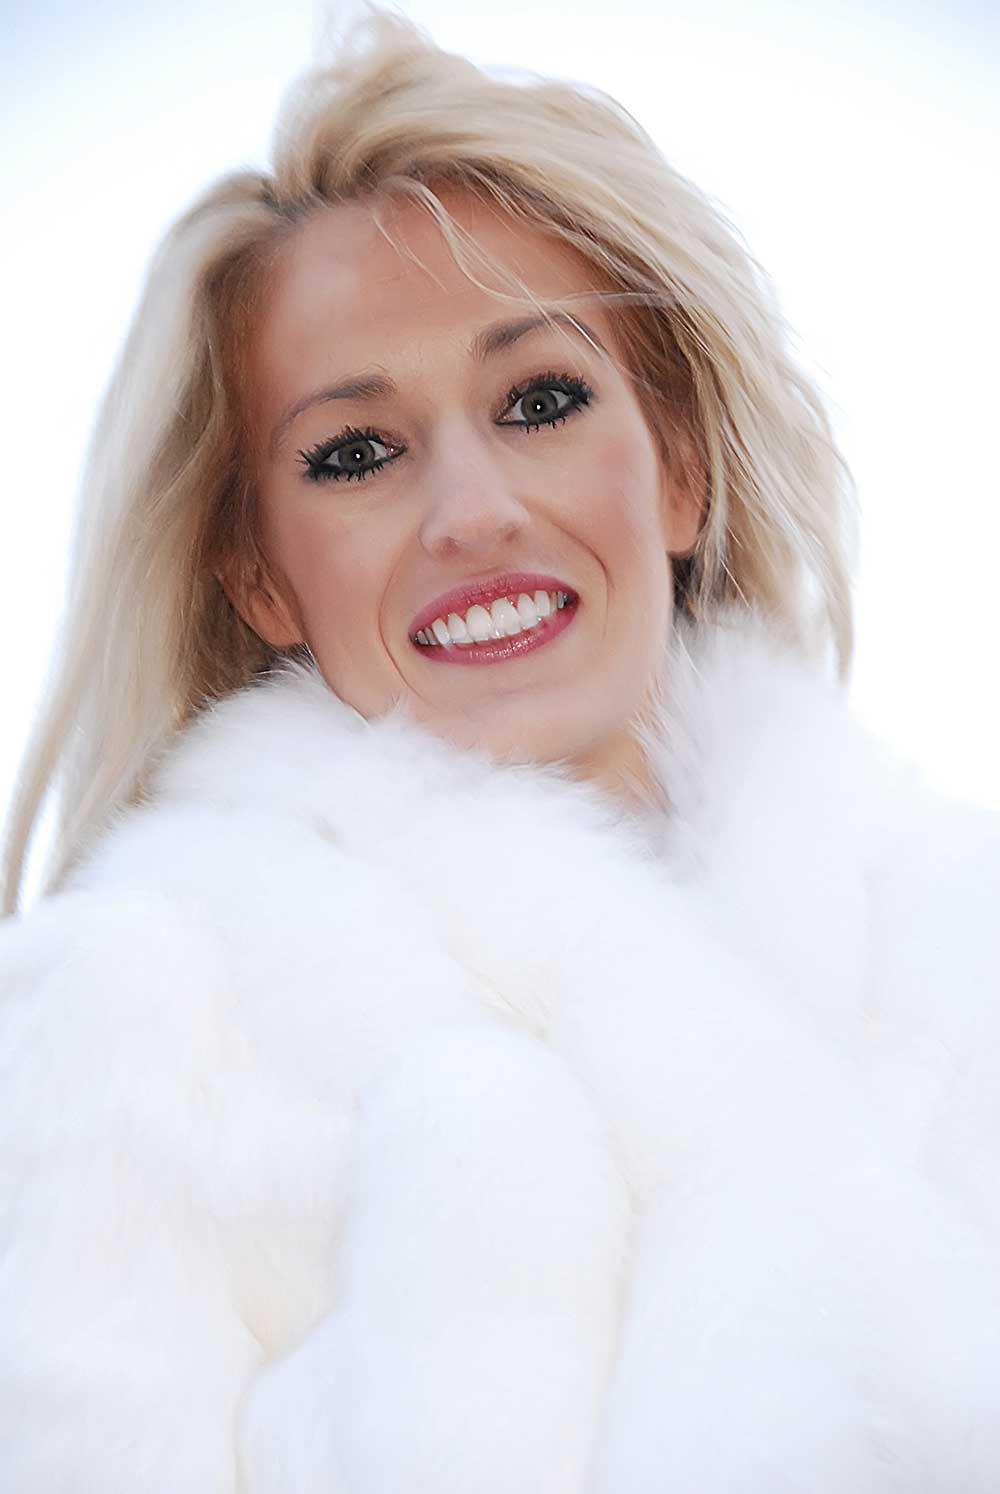 Portrait de la mariee blonde en fourrure blanche